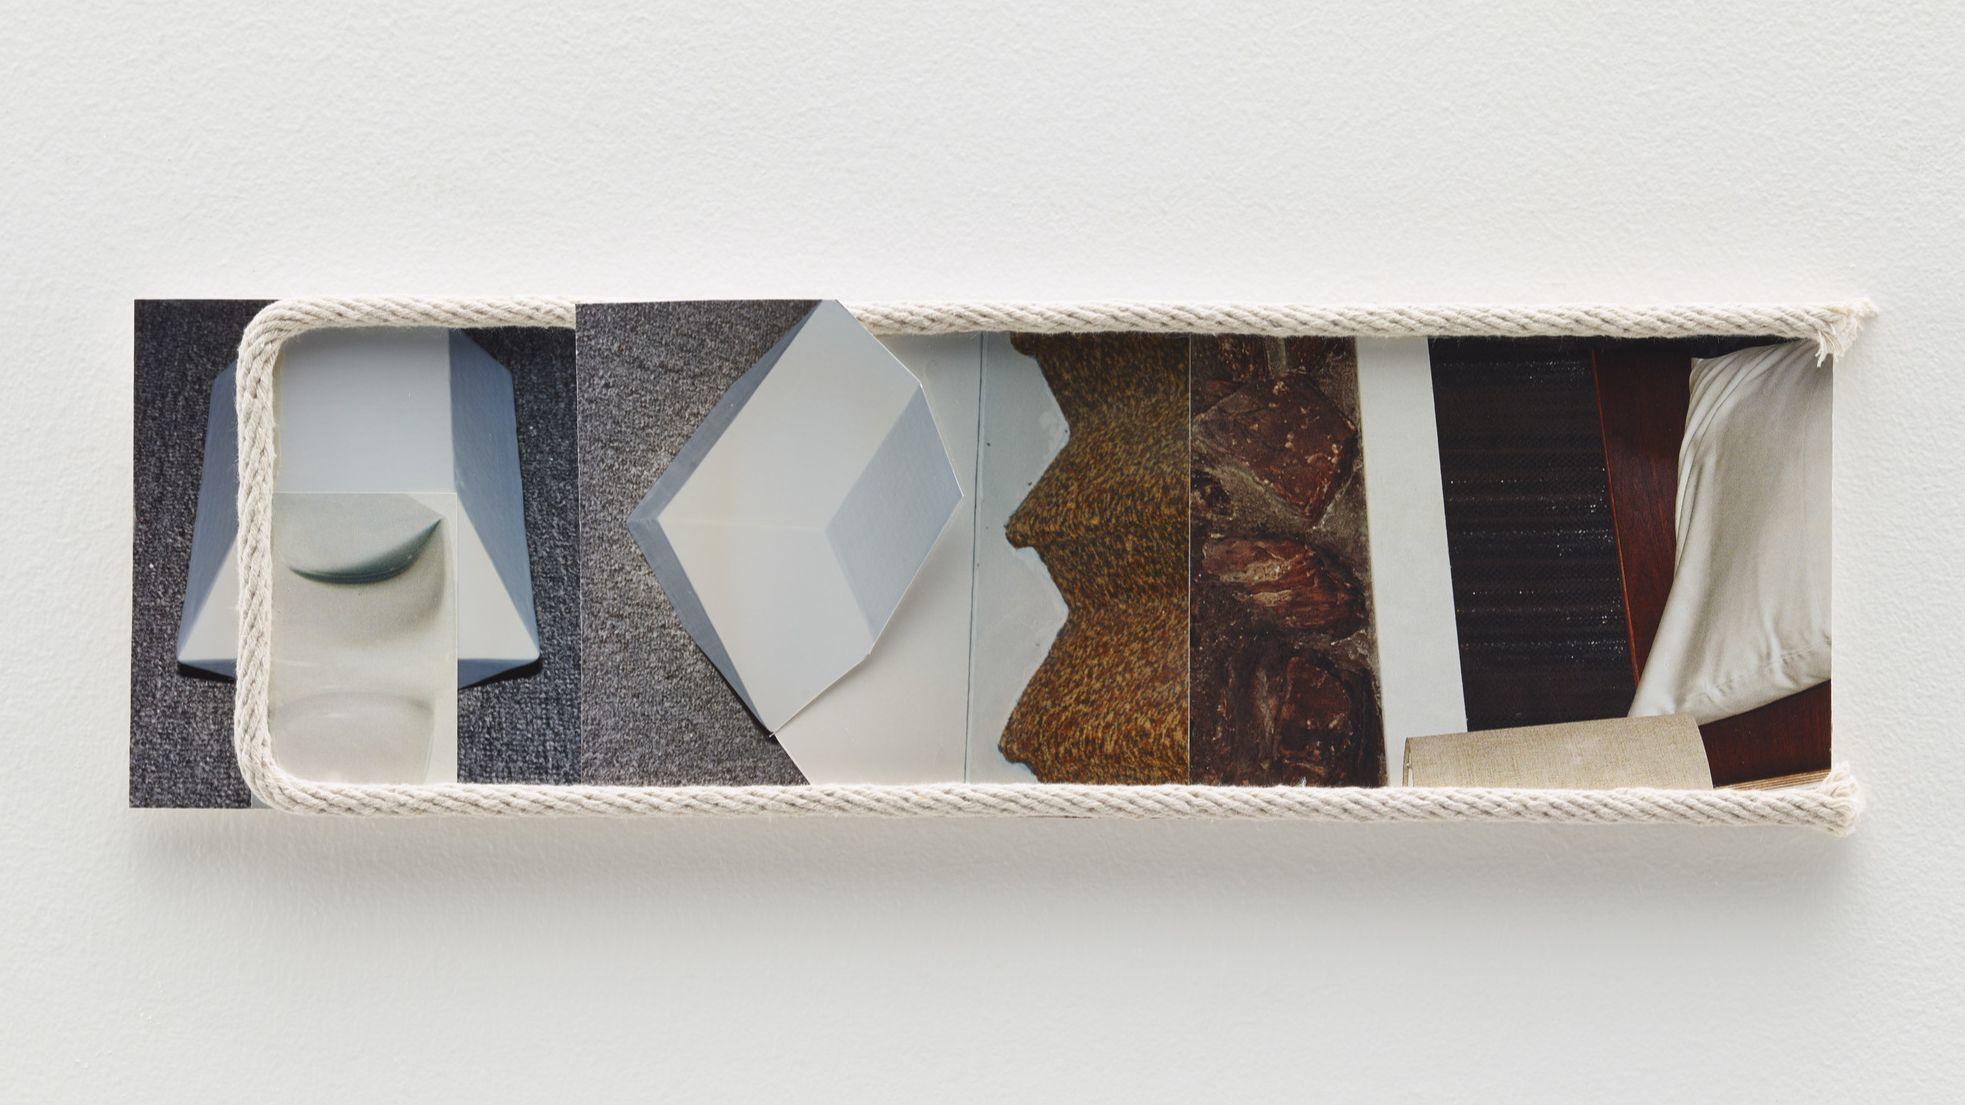 Vincent Fecteau at Matthew Marks Gallery